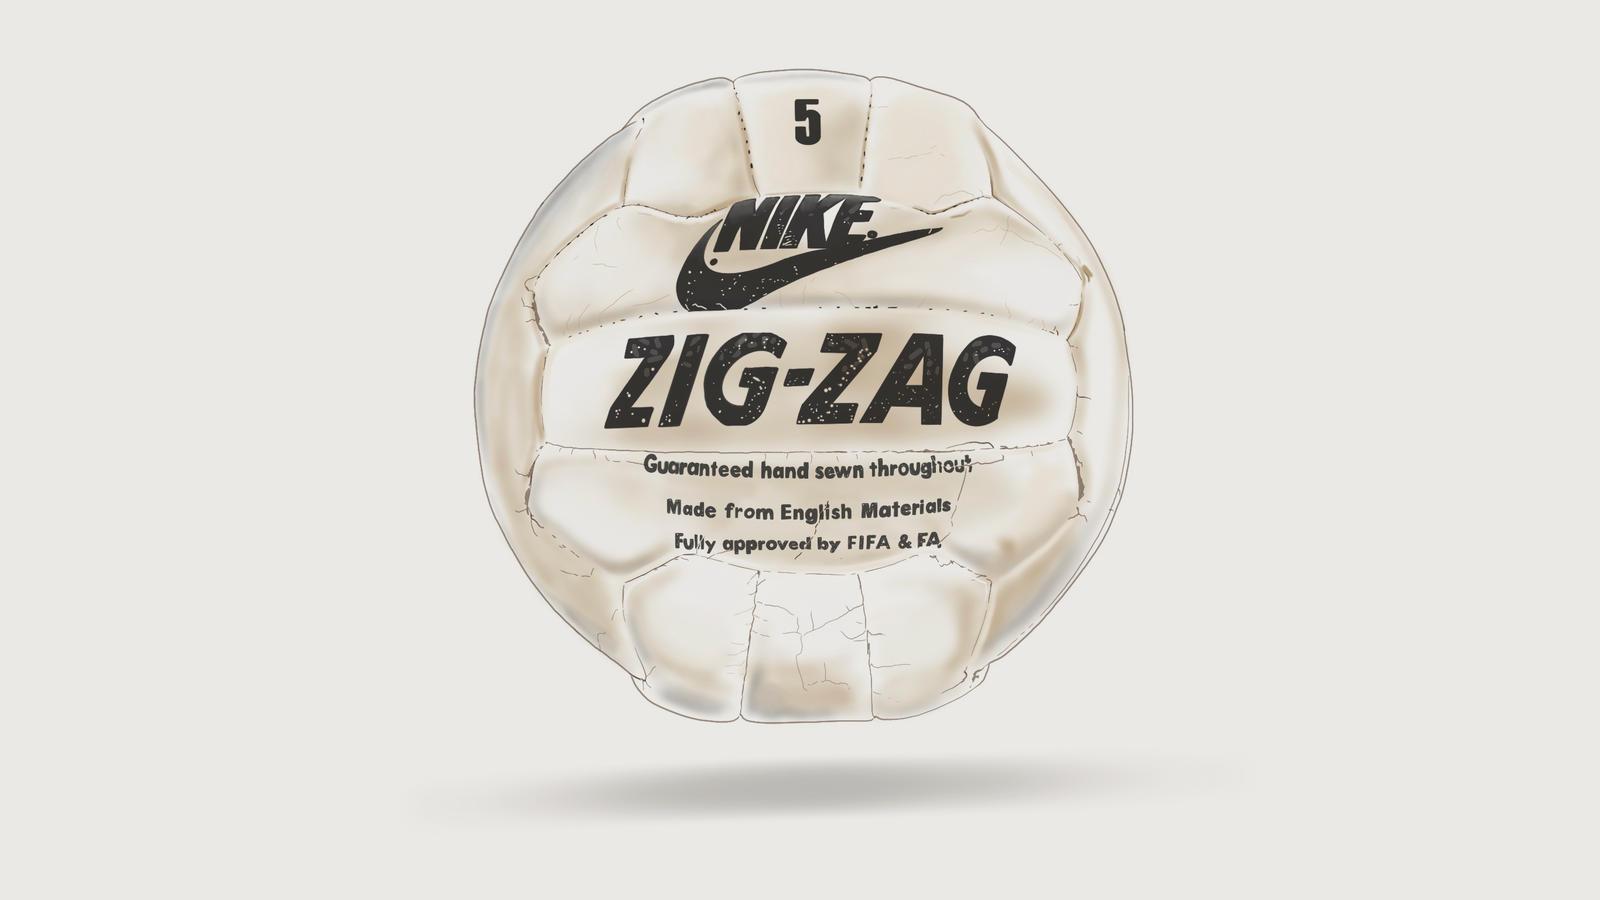 Nike Flight Ball 2